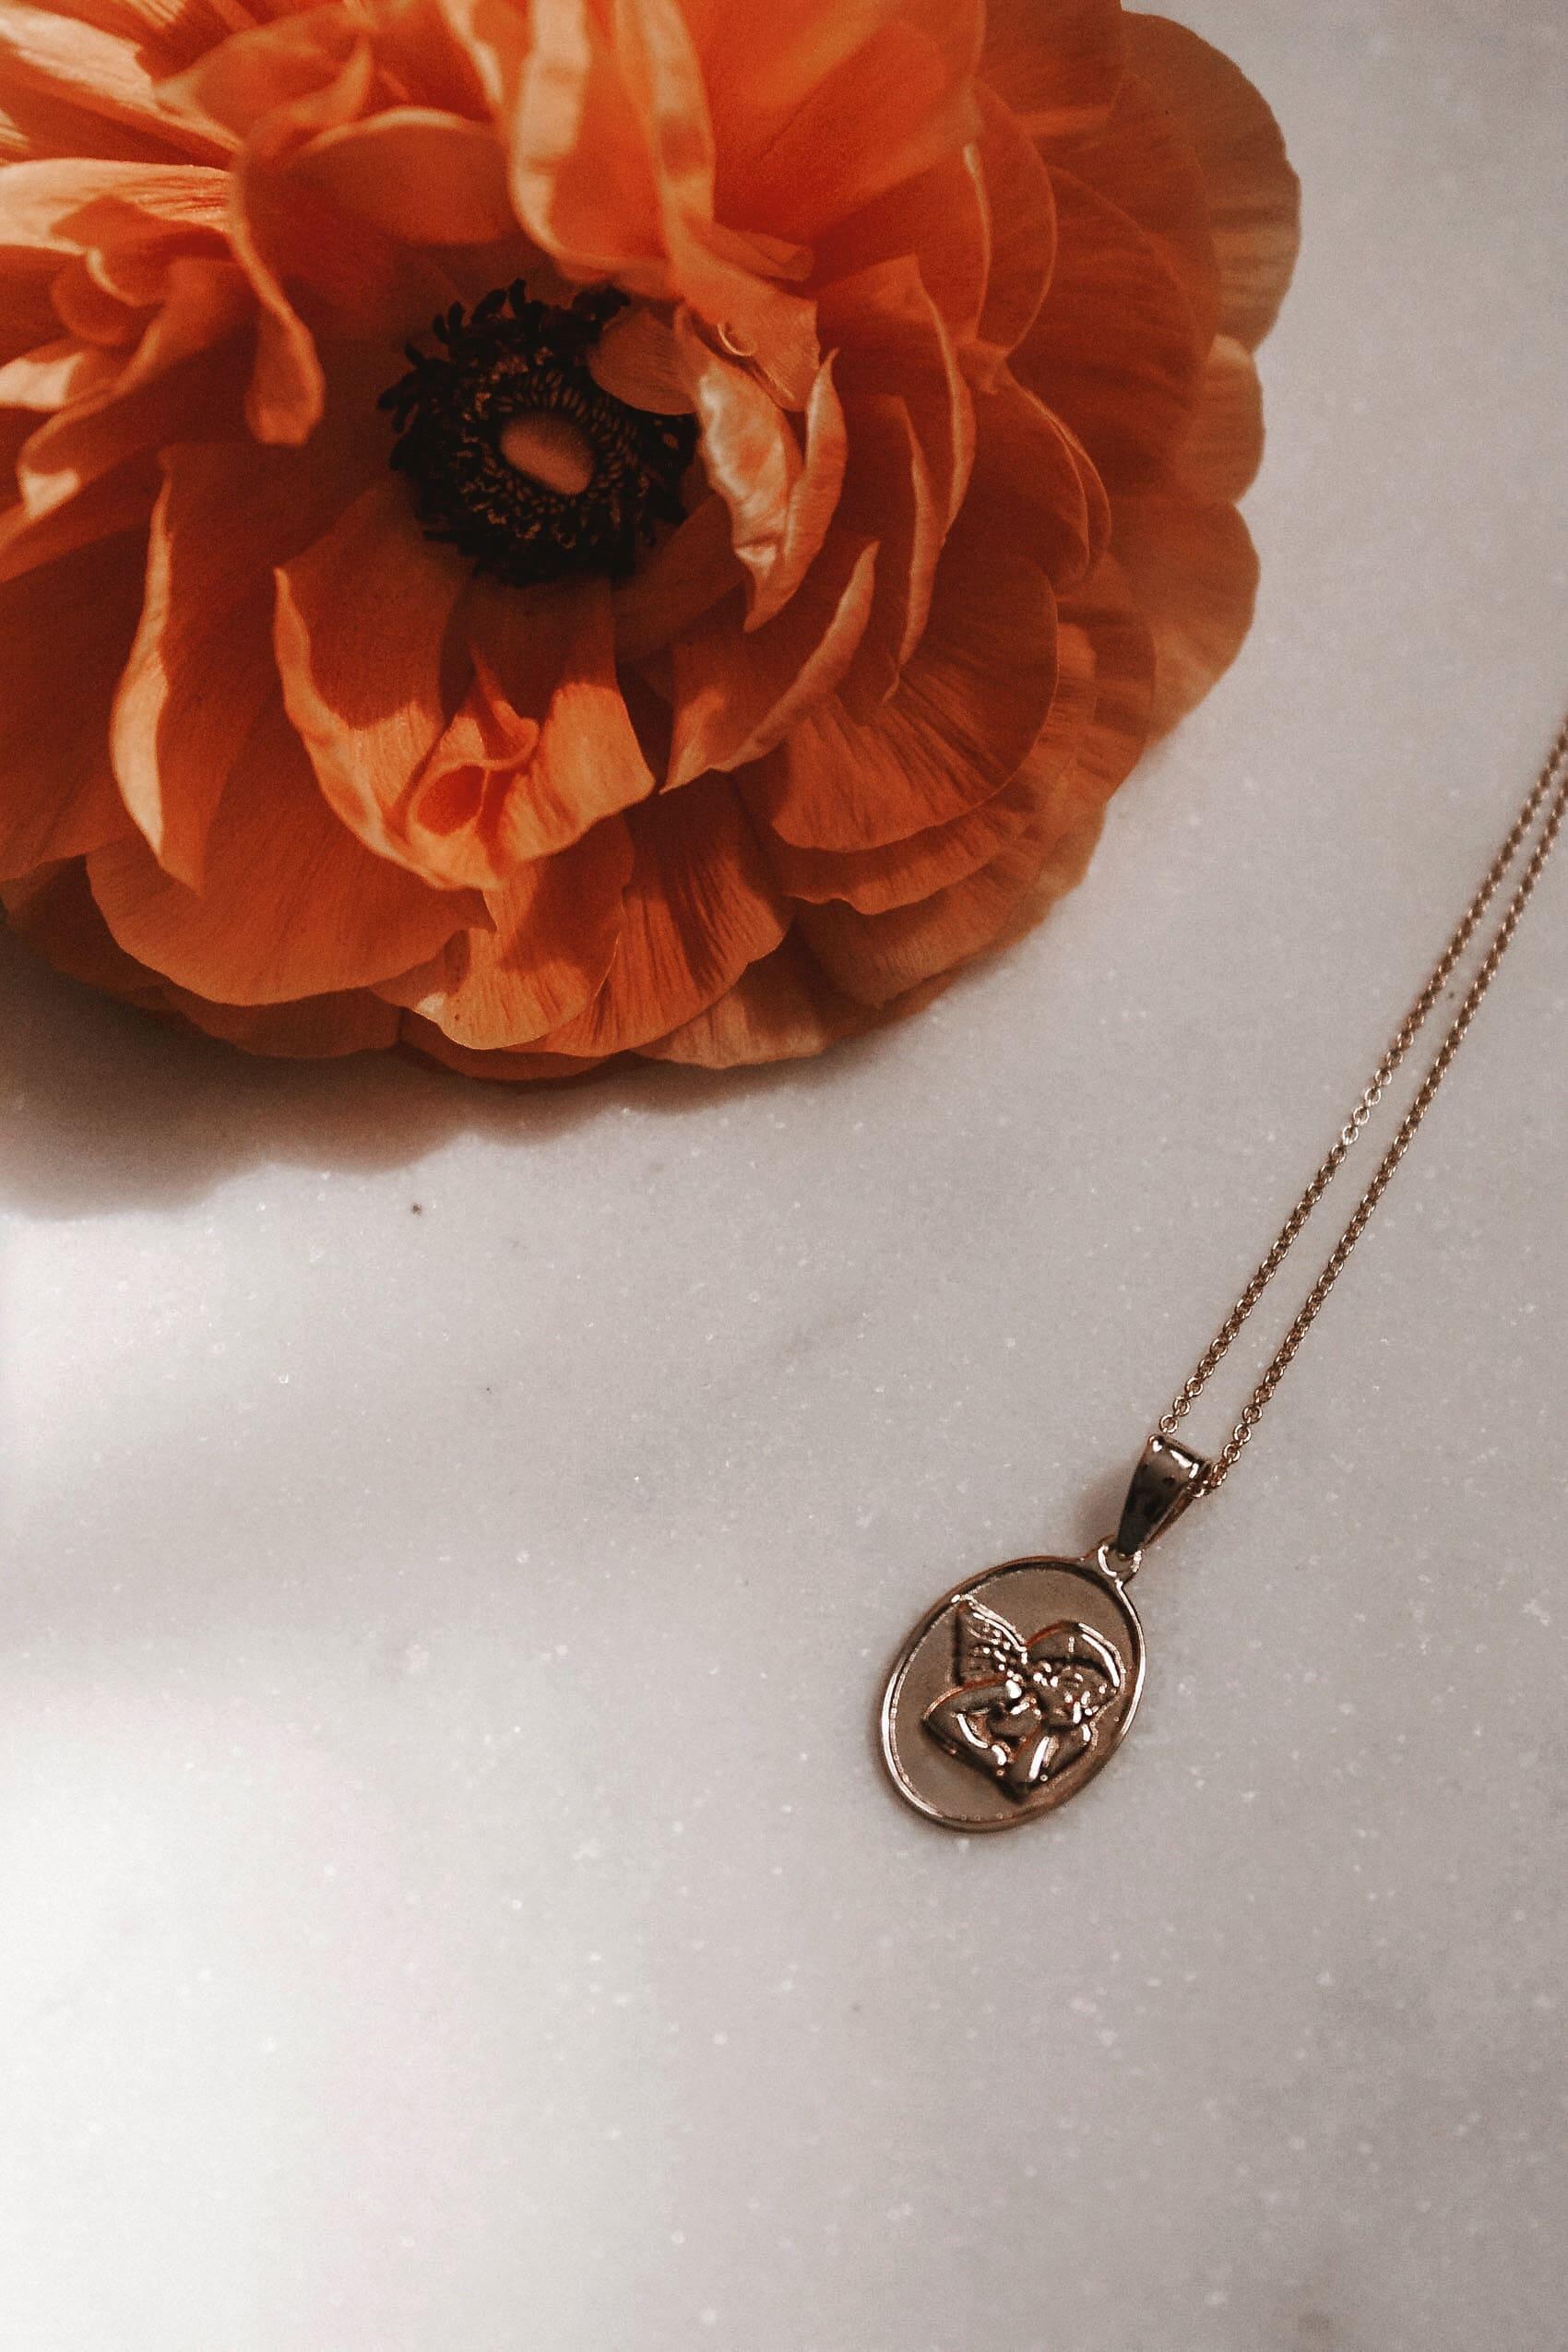 Kinn Studio Elusive Dream Pendant, Modern Jewelry Heirlooms